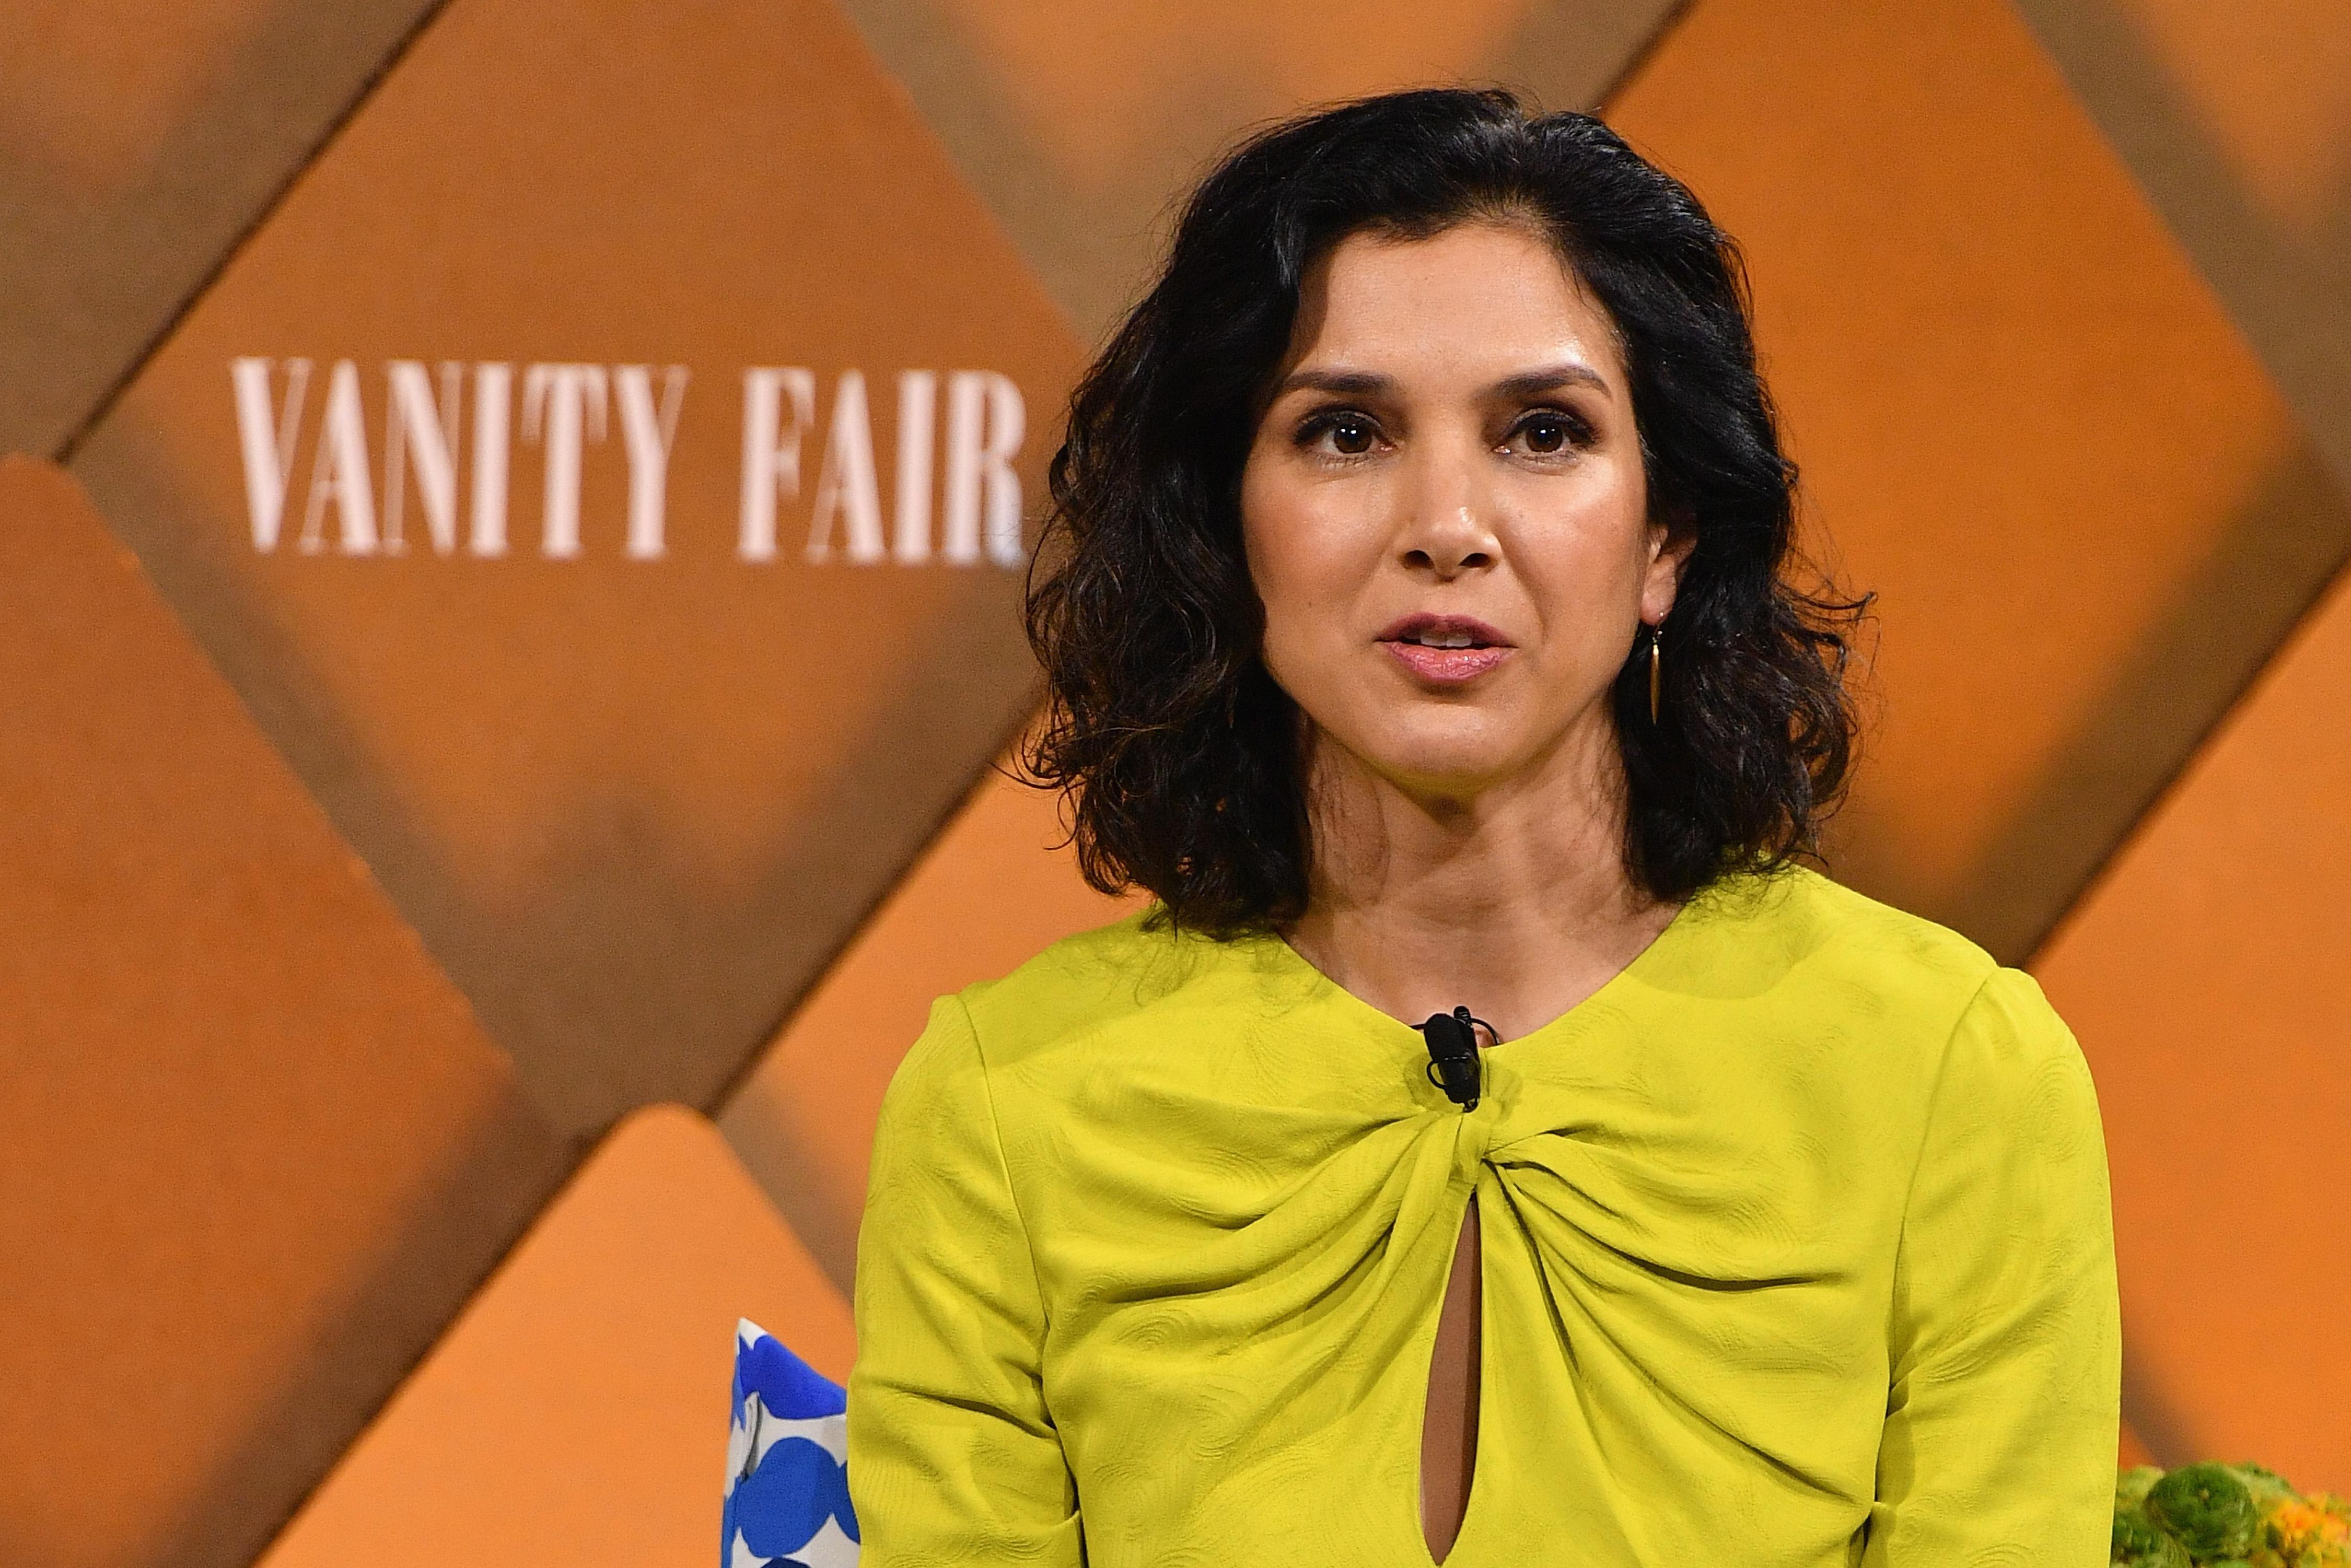 Vanity Fair Editor Radhika Jones